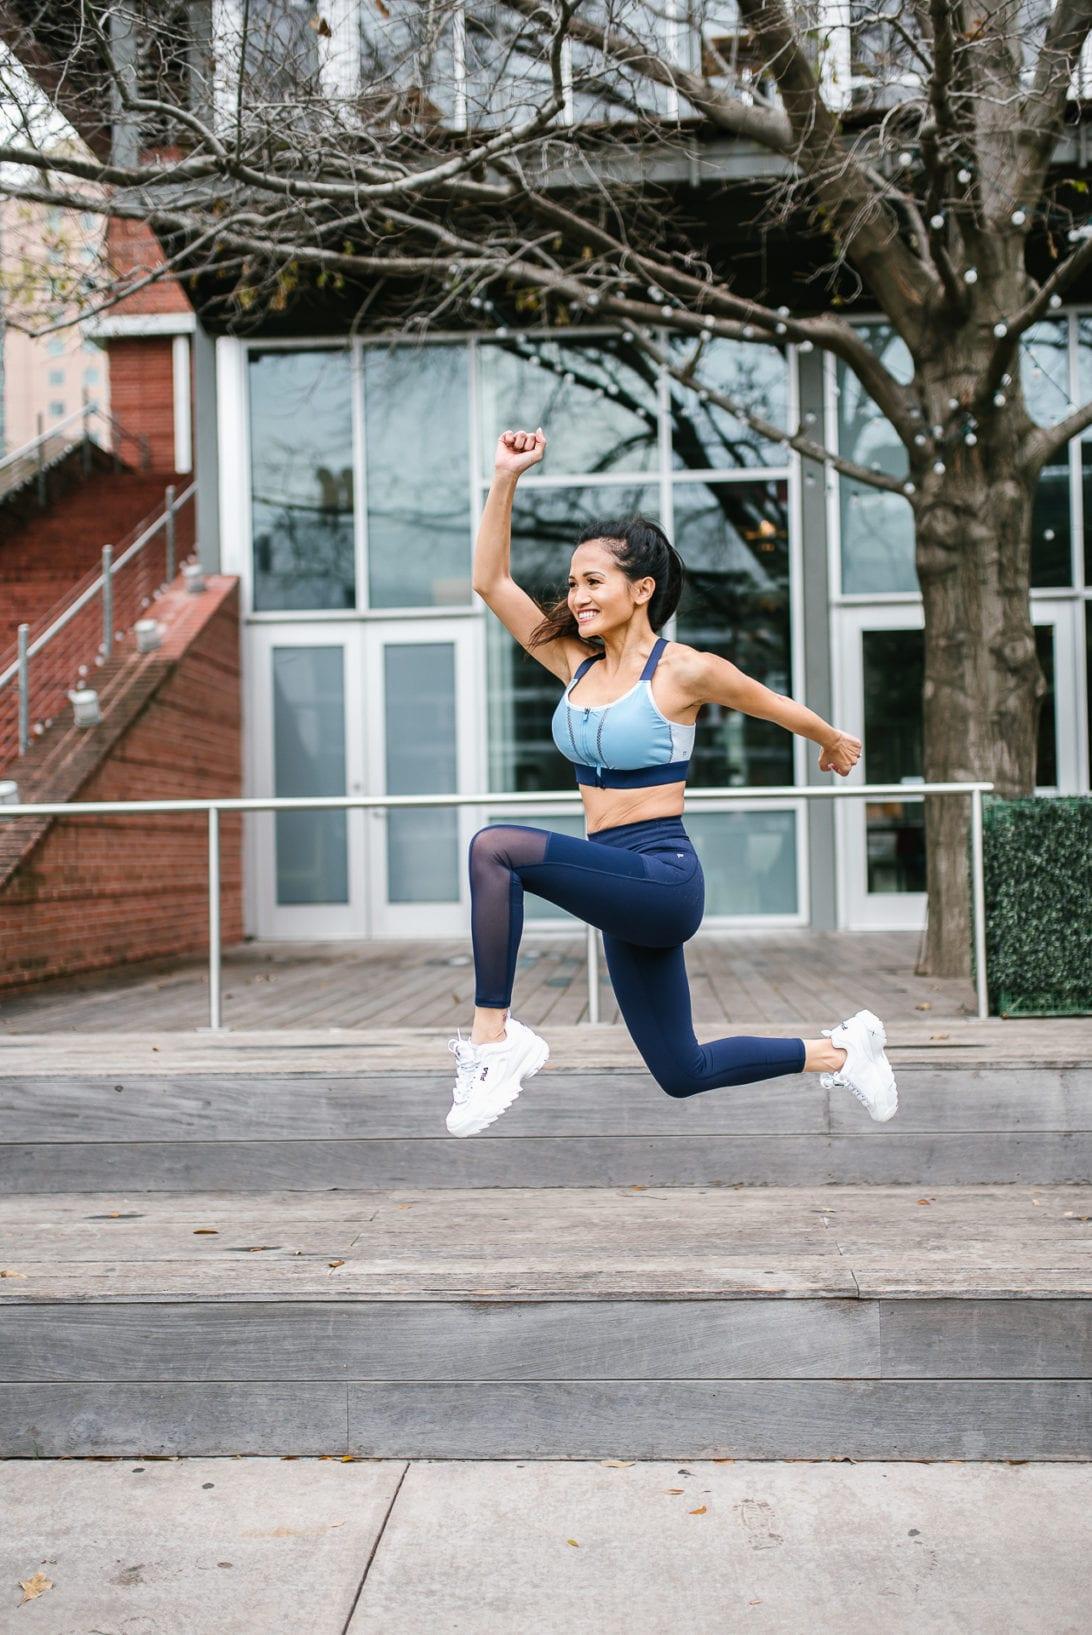 jumping shot, action shot, fitness motivation